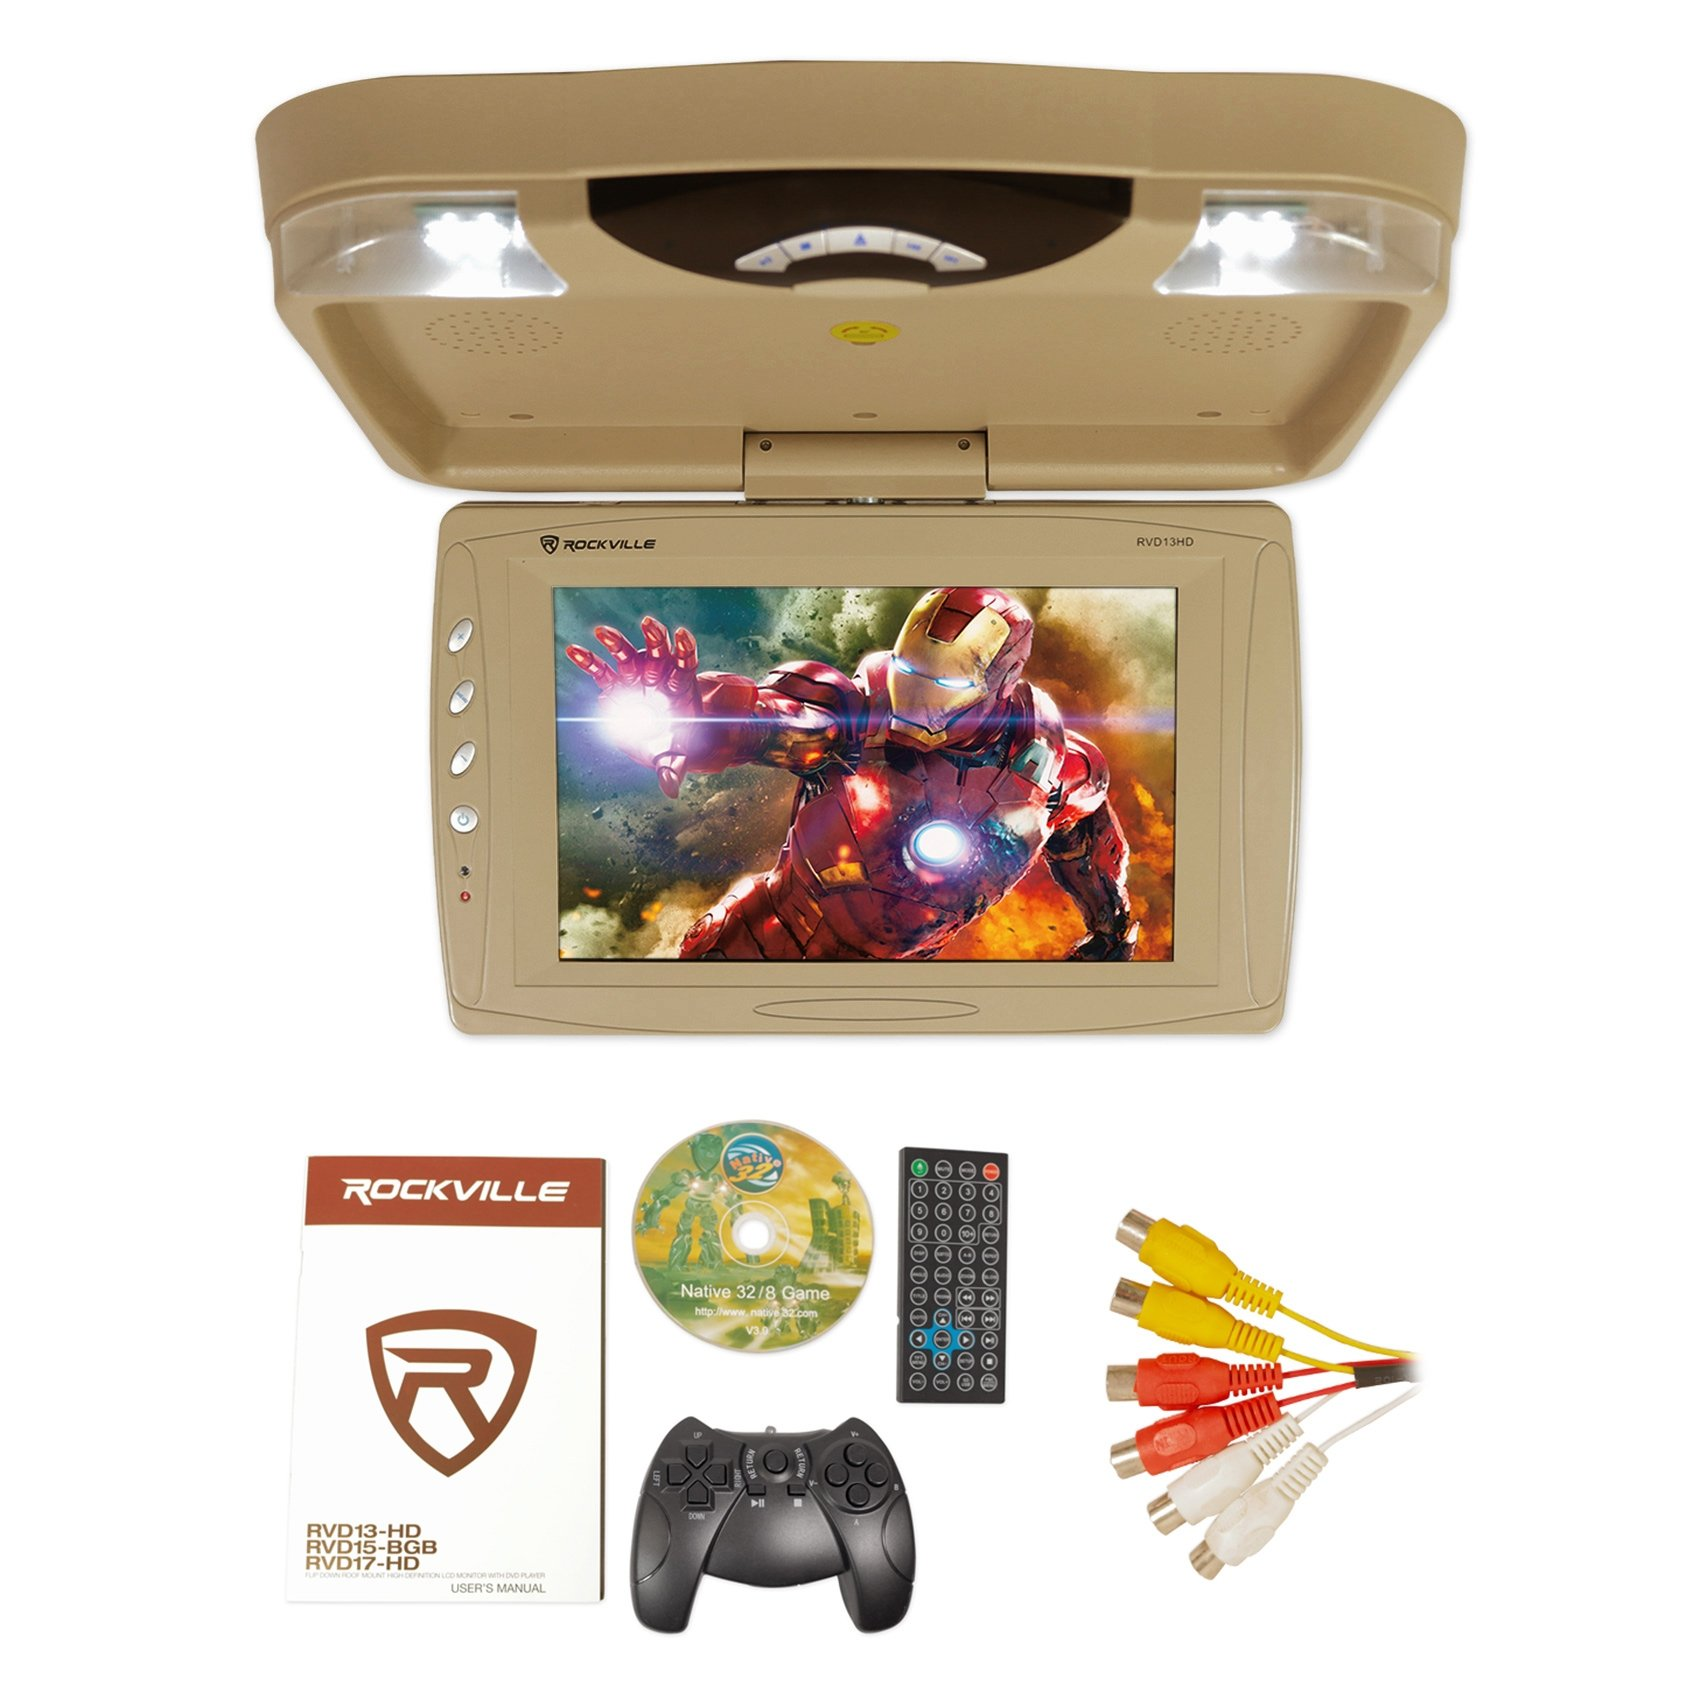 Rockville RVD13HD-BG BEIGE 13'' Flip Down Car Monitor w DVD/HDMI/USB/SD/Games Tan